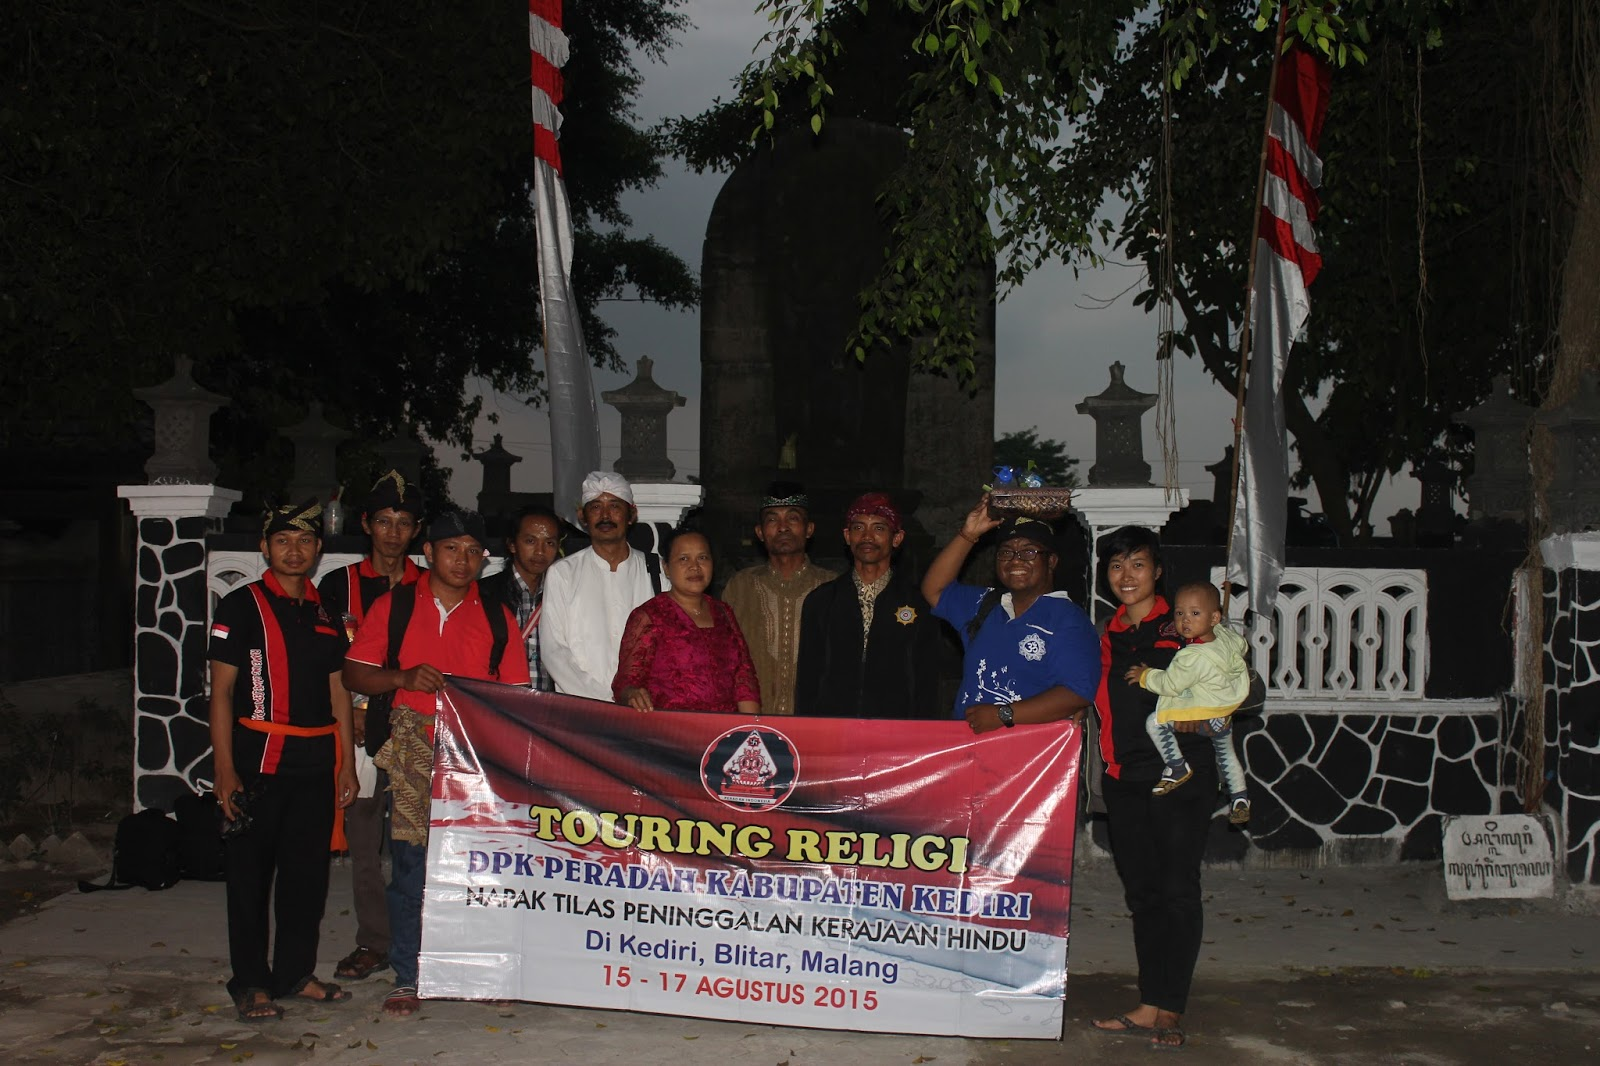 Touring Religi Dpk Kediri Heri Herdinata Diri Sendang Tirto Kamandanu